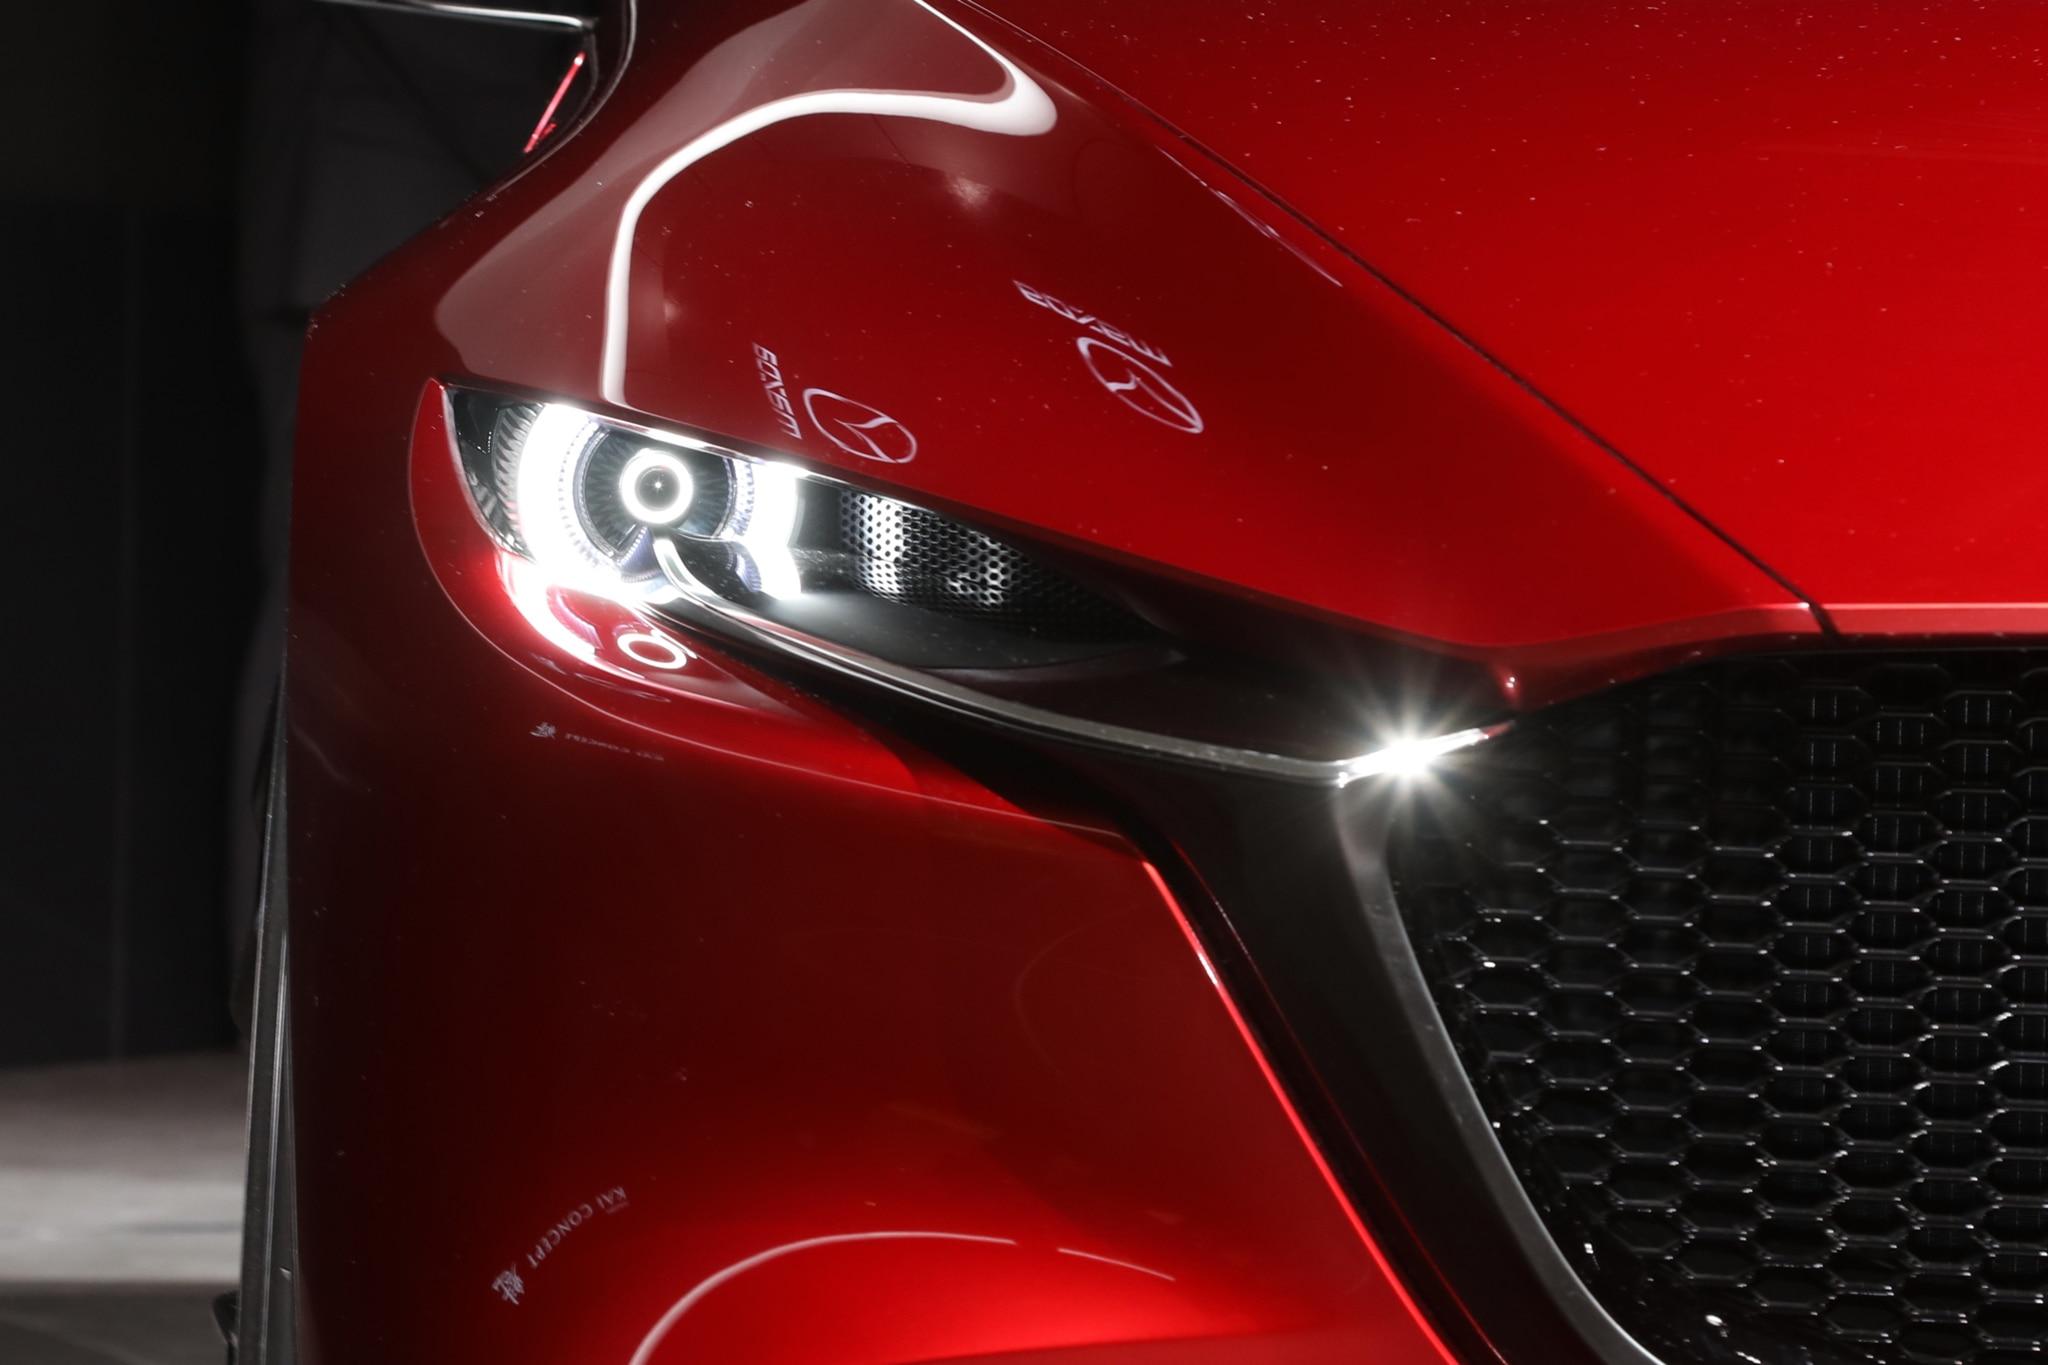 Mazda Kai Concept Ups the Compact Hatchback Ante | Automobile Magazine